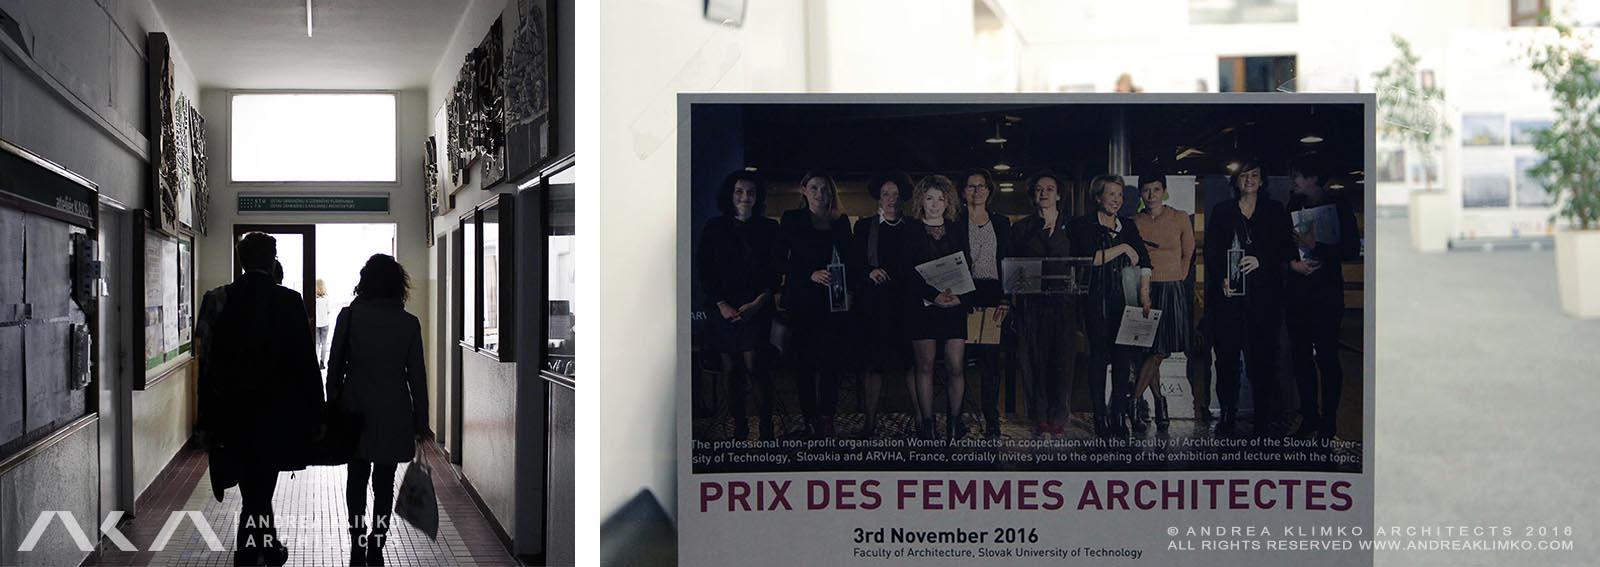 prix-des-femmes-architectes-on-display-in-bratislava_12